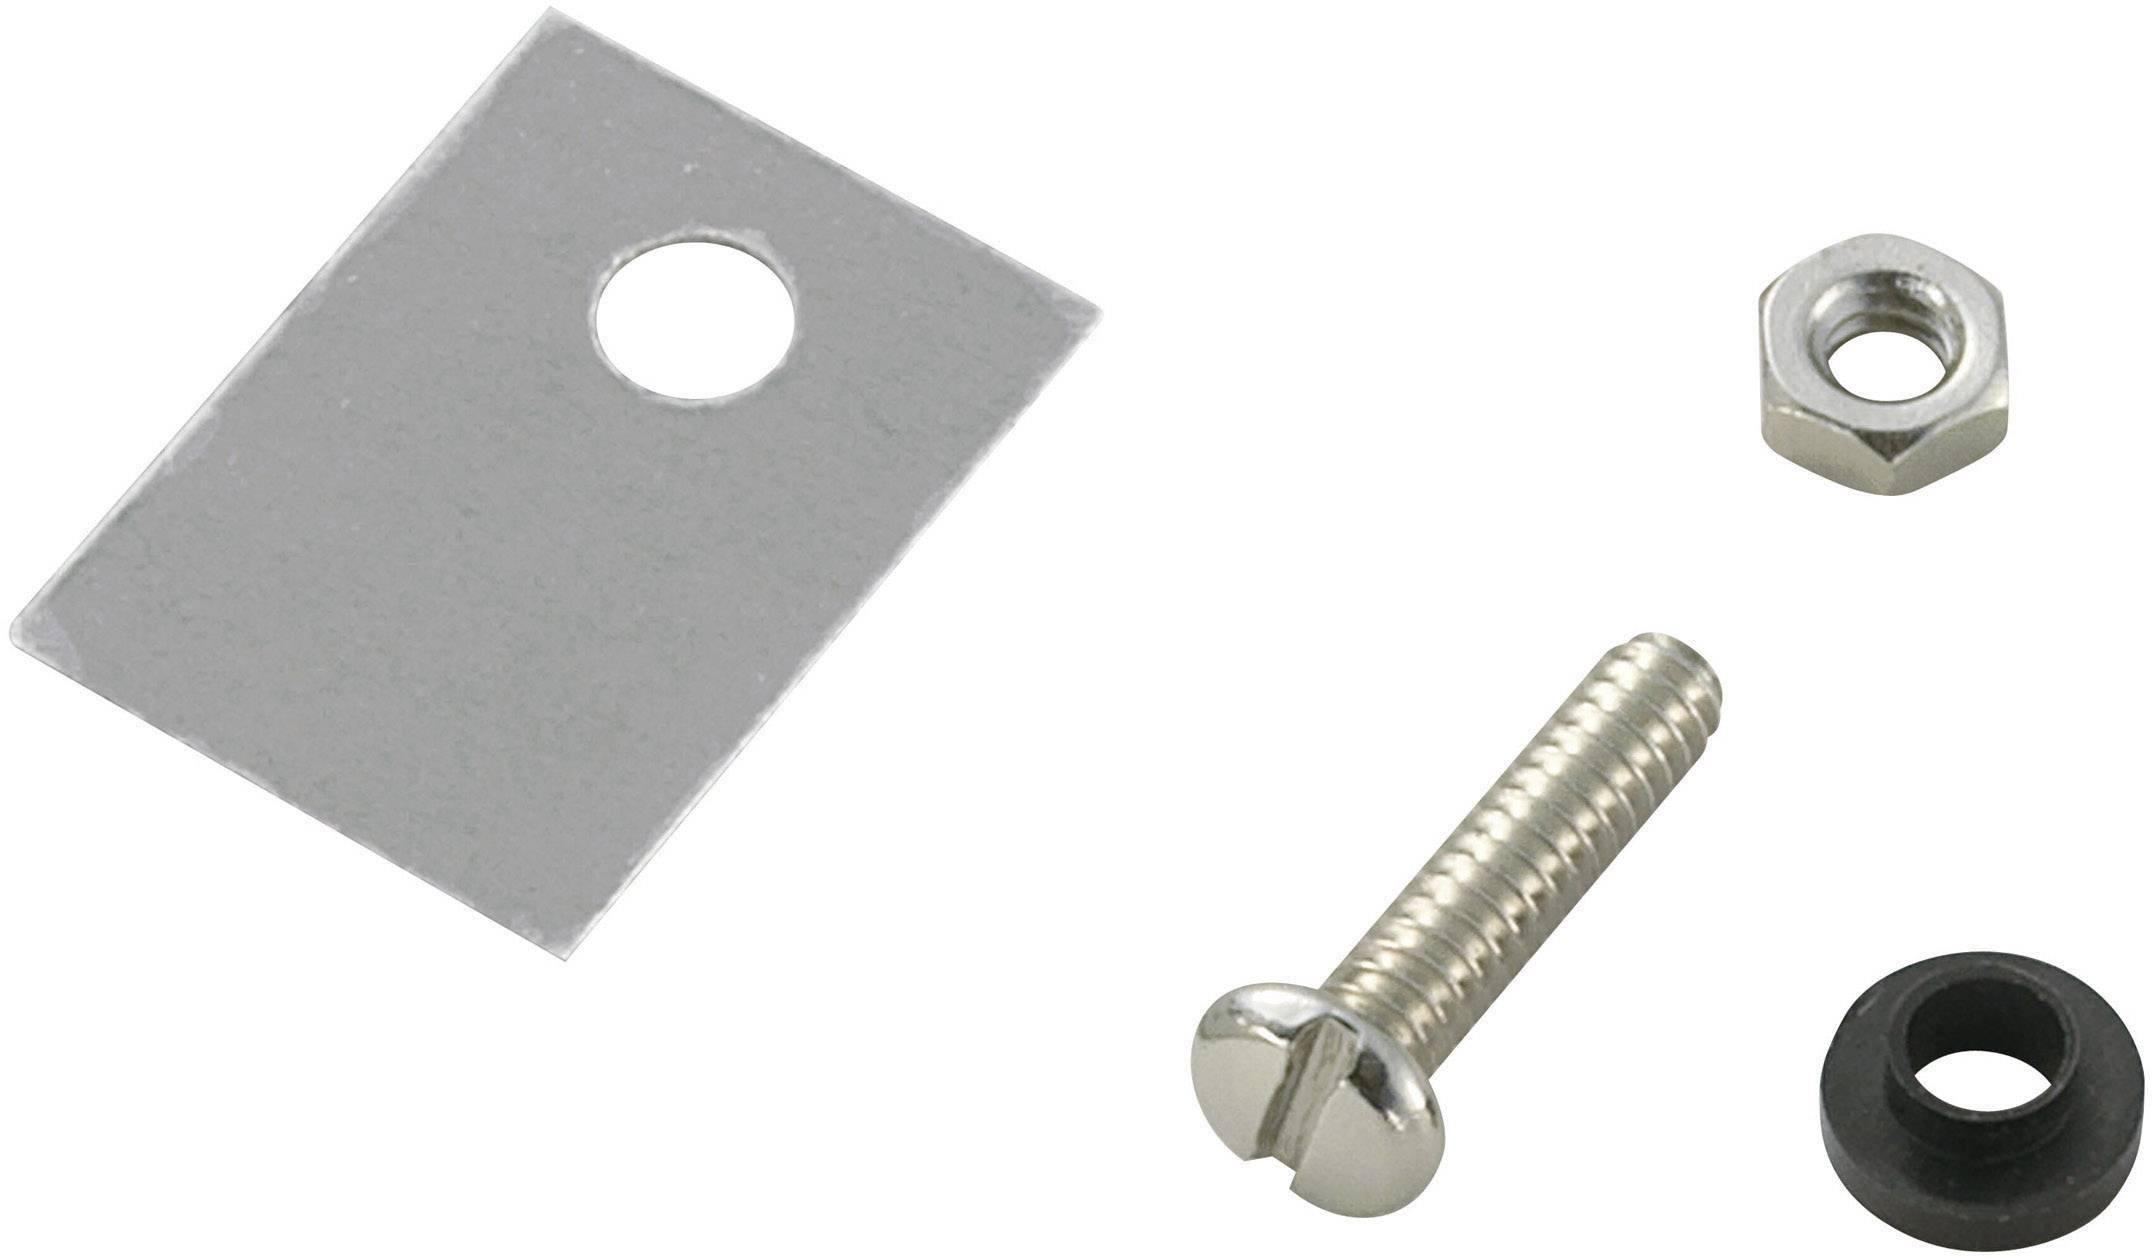 Sada montážneho materiálu pre polovodiče TRU COMPONENTS TC-A18-9B, (d x š) 18 mm x 13 mm, 1 sada